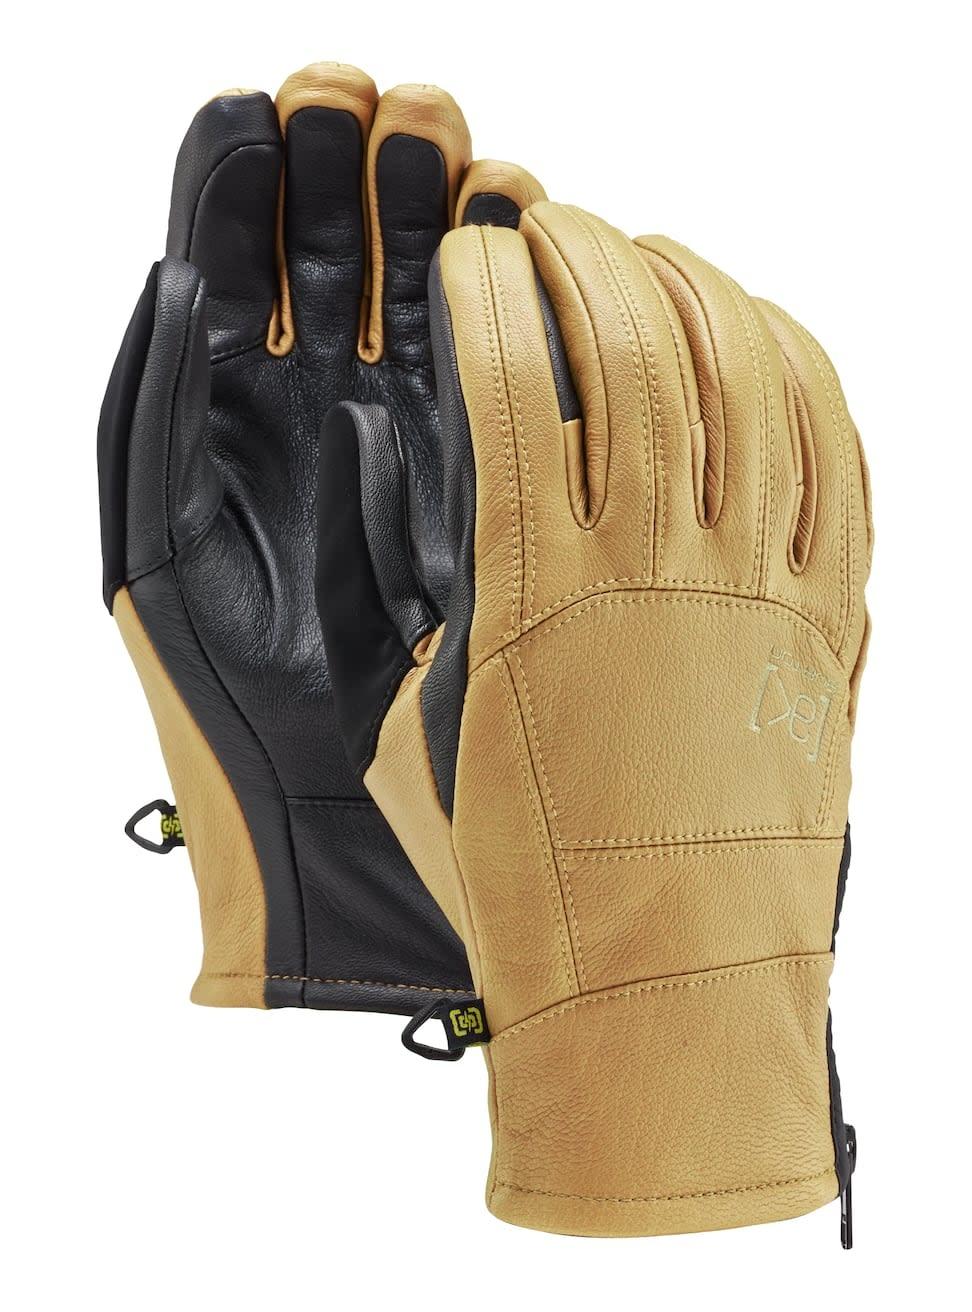 burton Snowboards Burton 2021 Leather Tech Glove - Raw Hide -